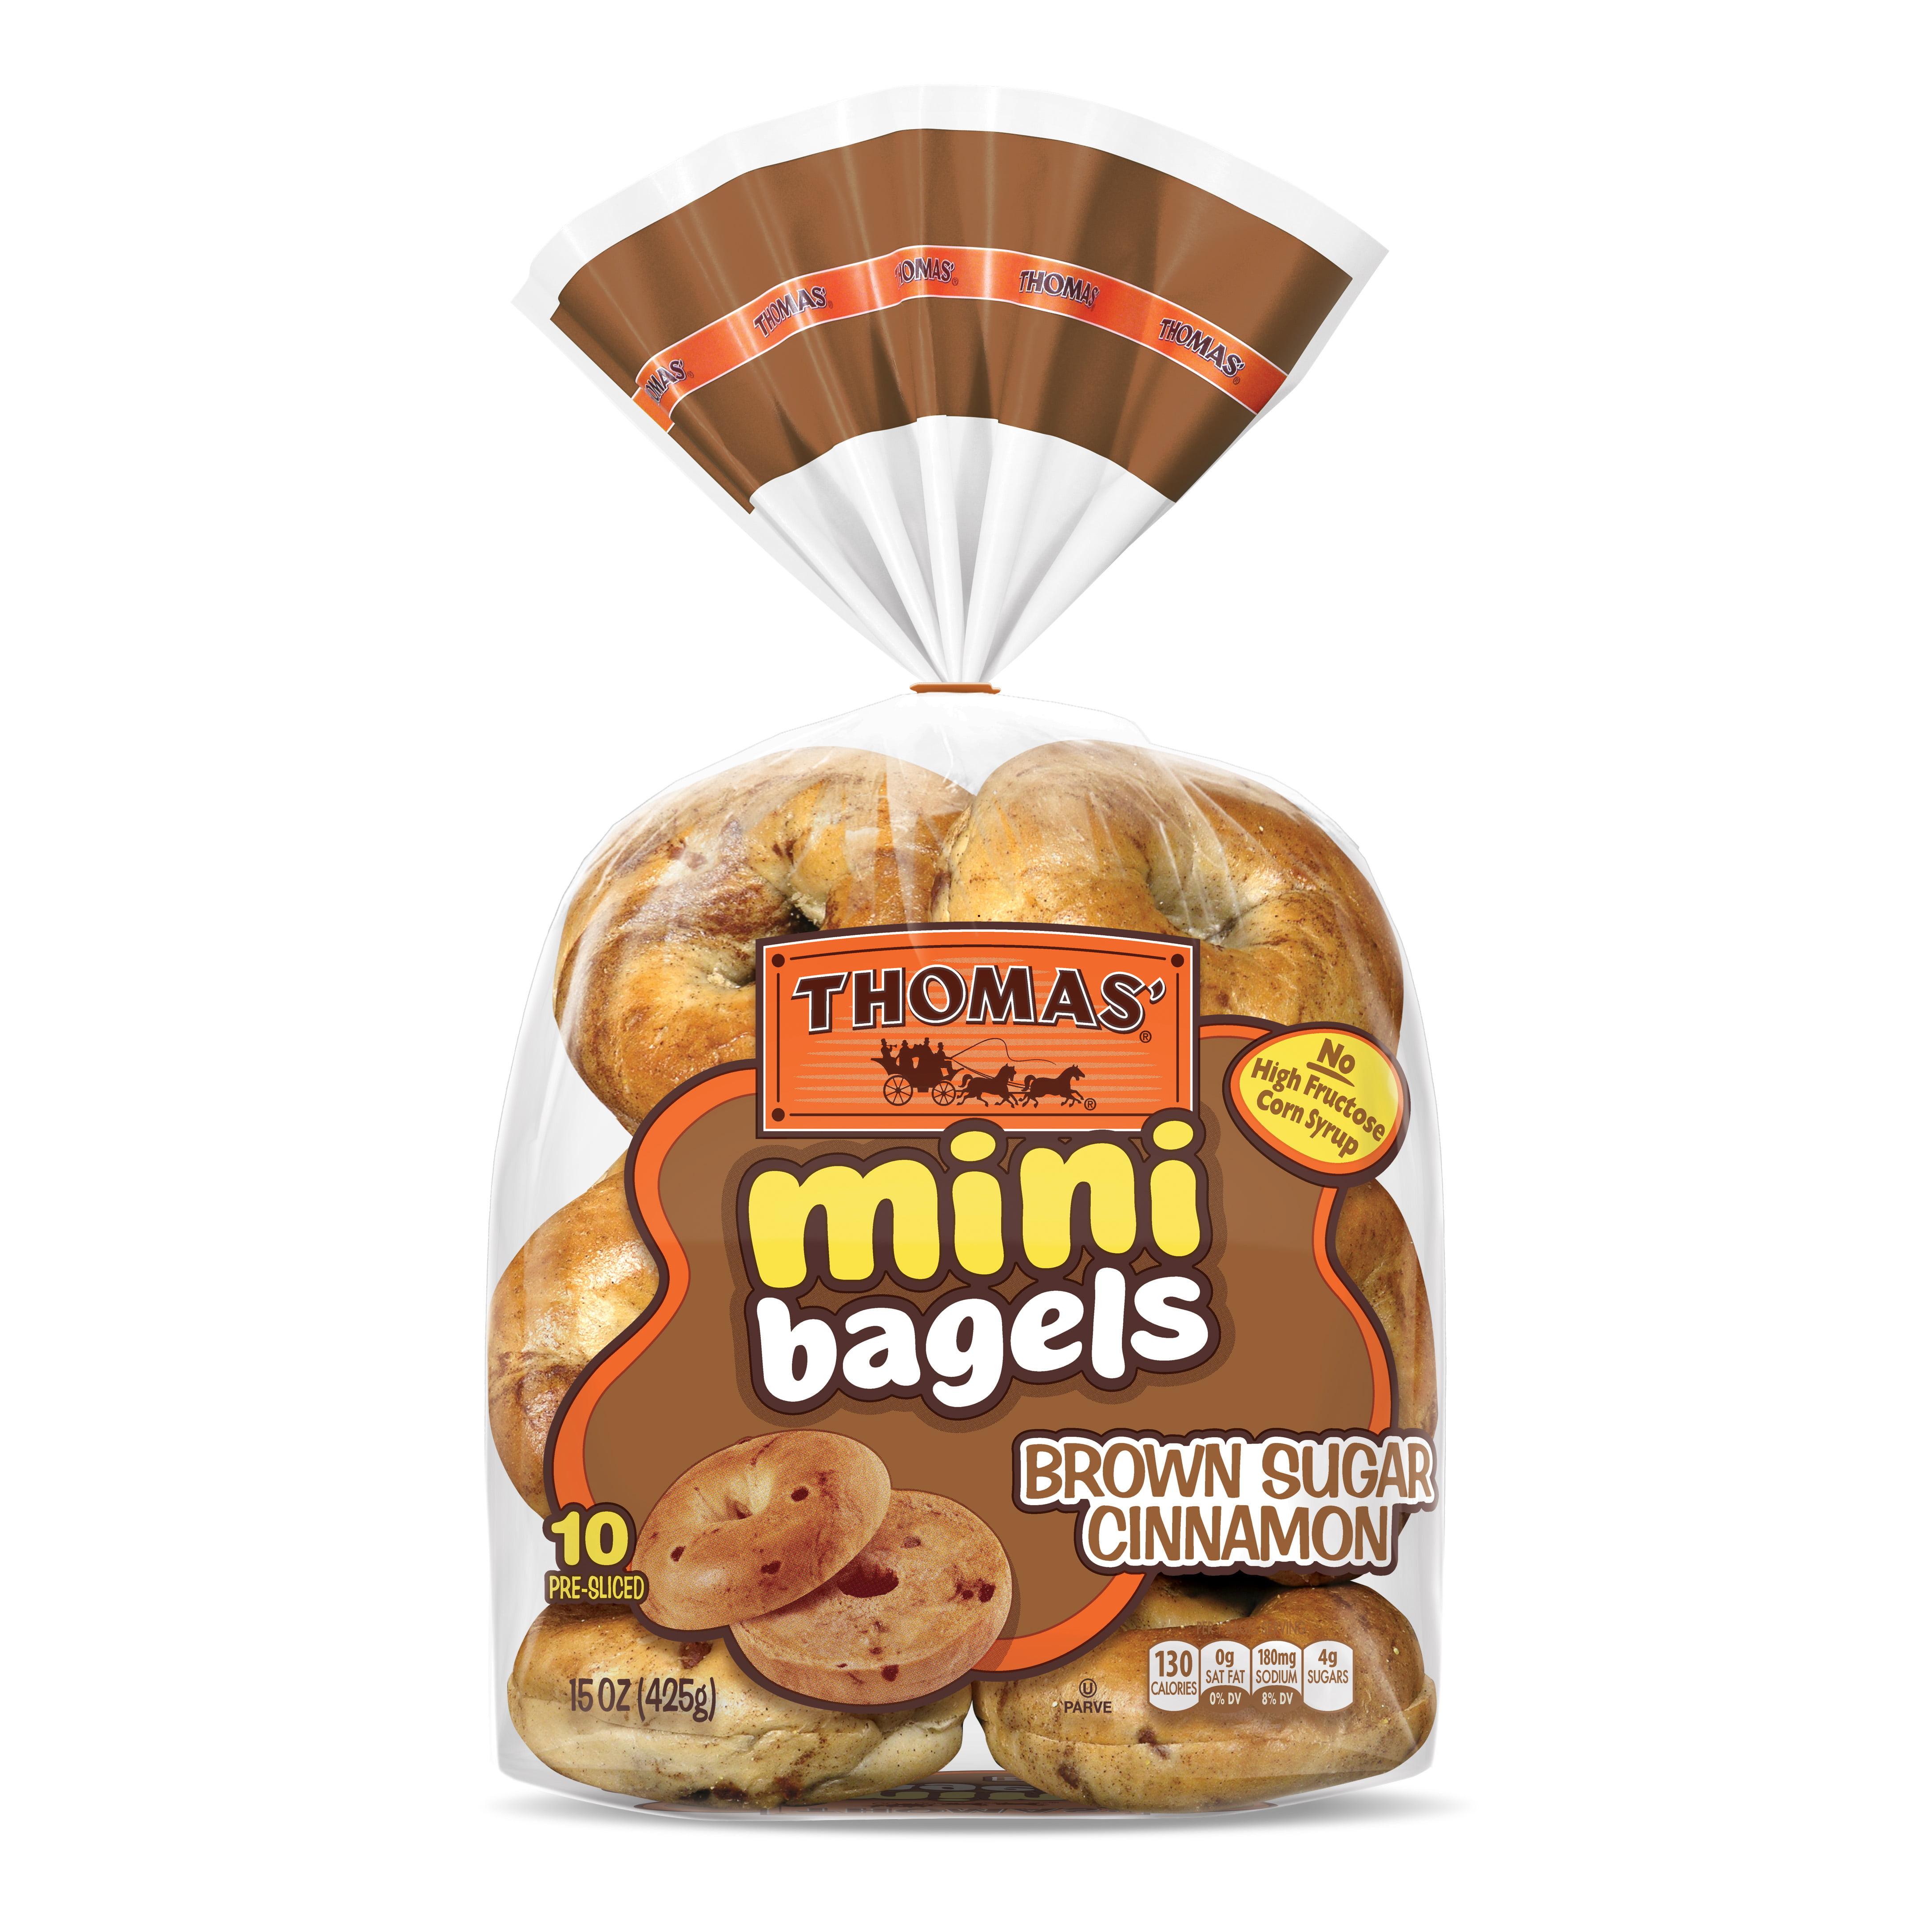 Thomas' Brown Sugar Cinnamon Mini Bagels, 10 count, 15 oz